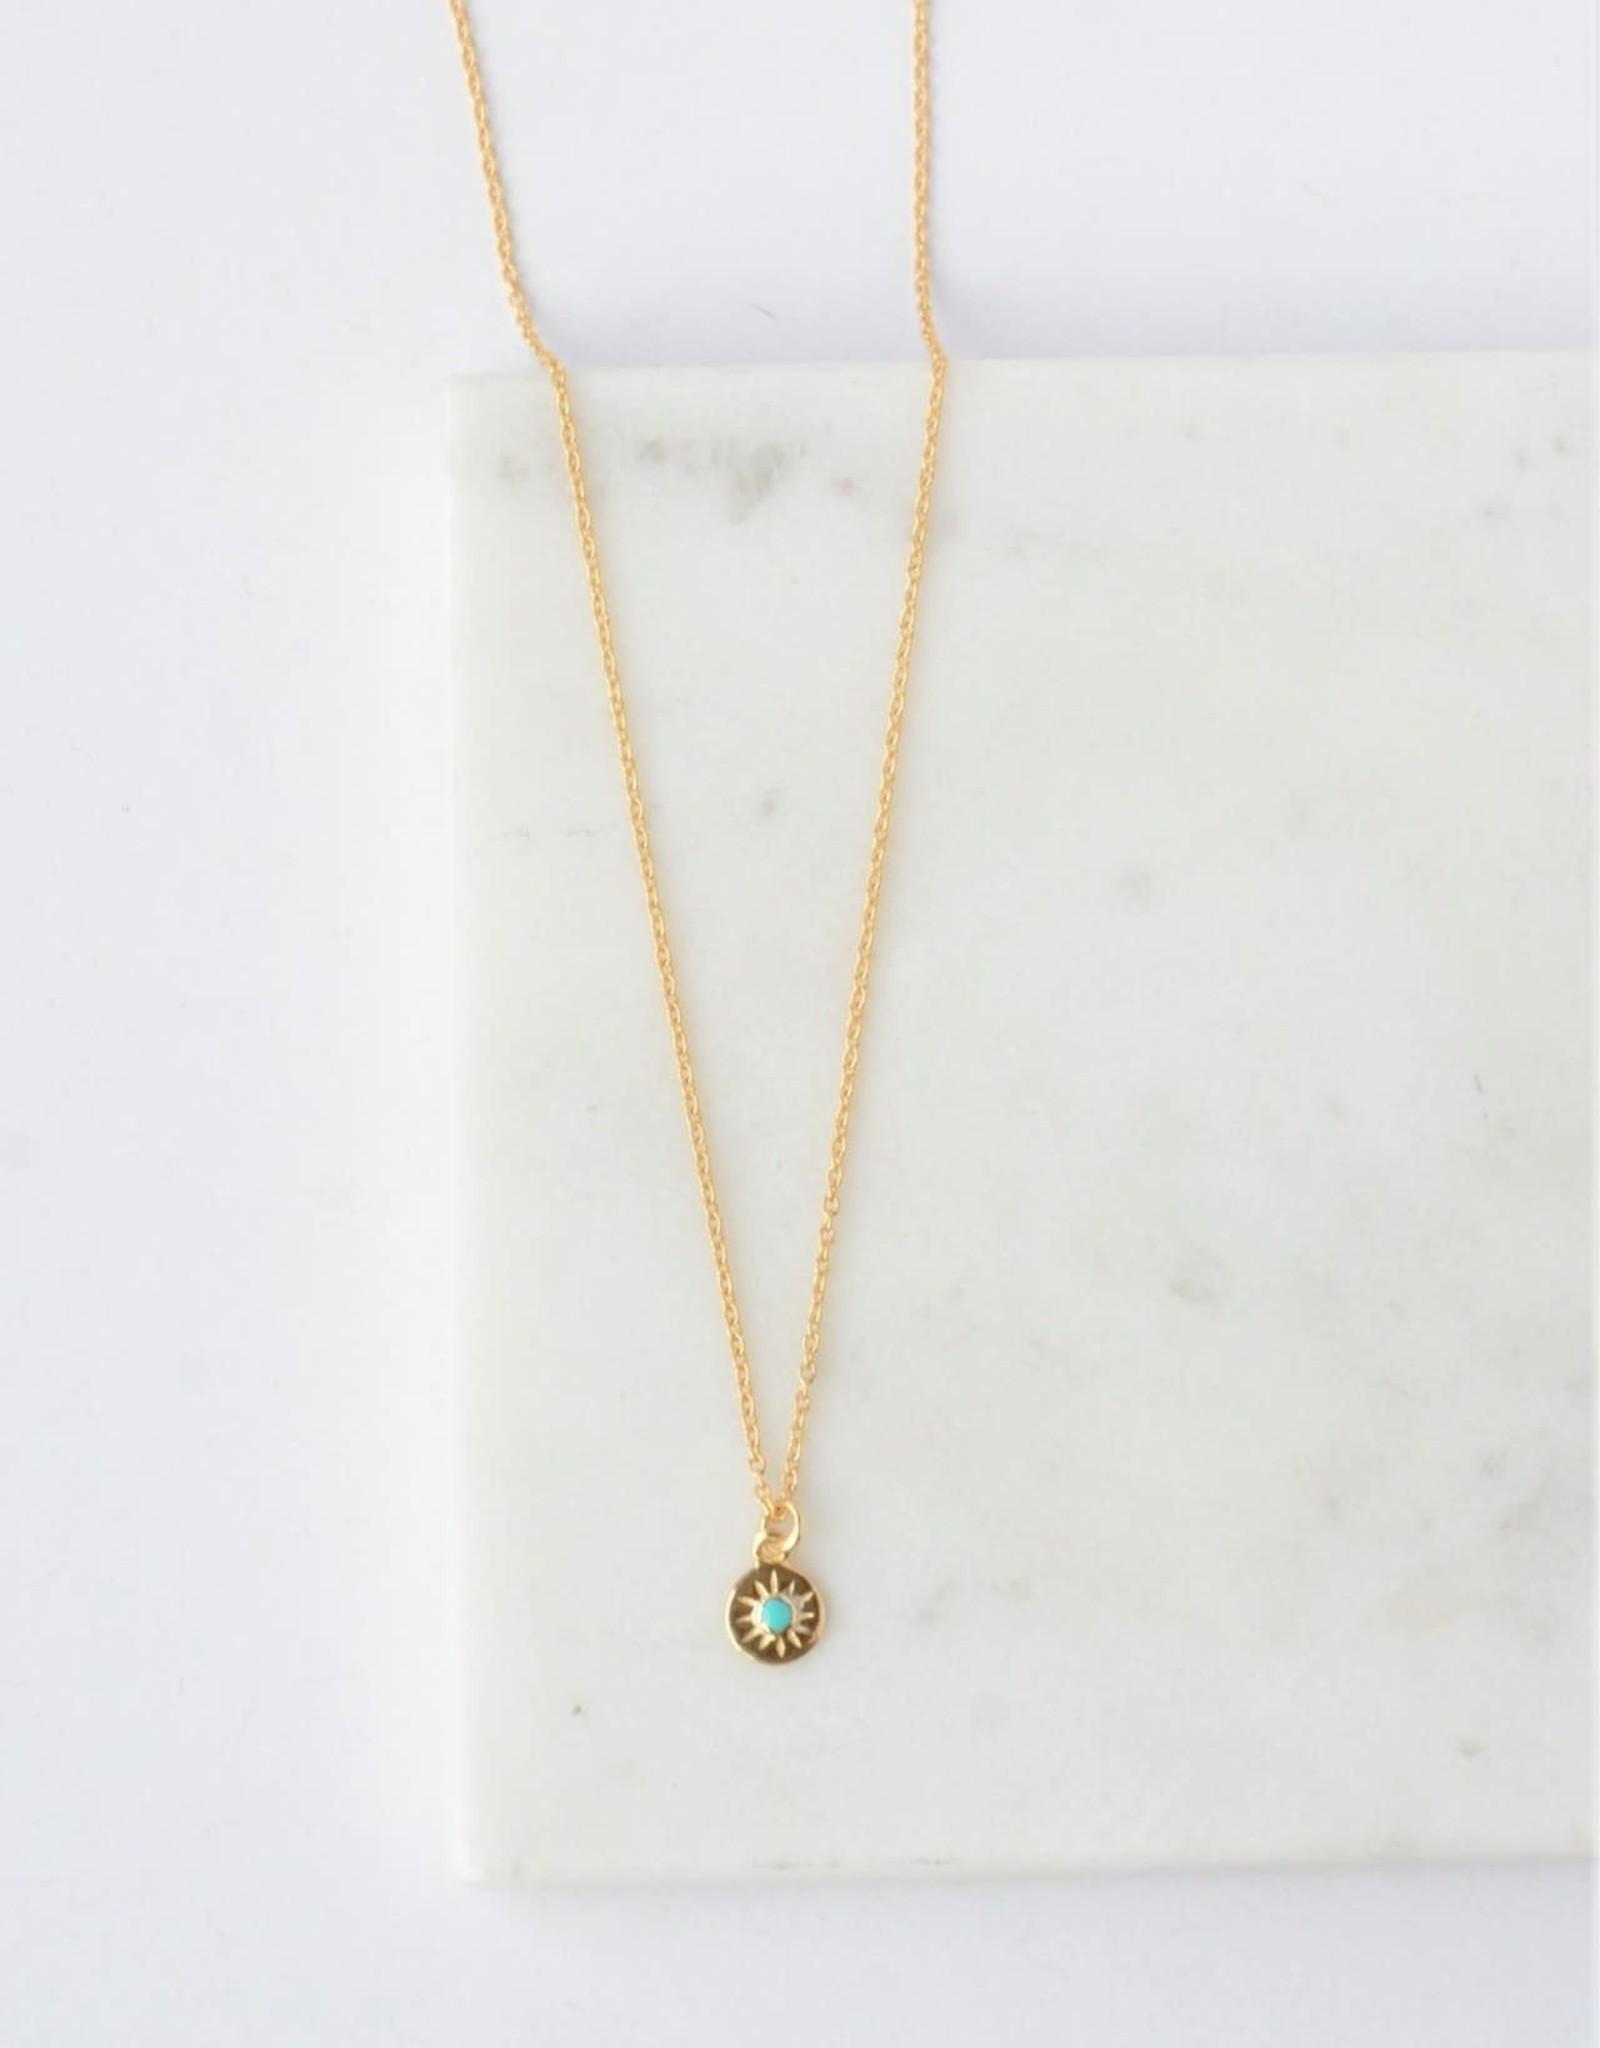 Starburst Turquoise 14kt gold Necklace